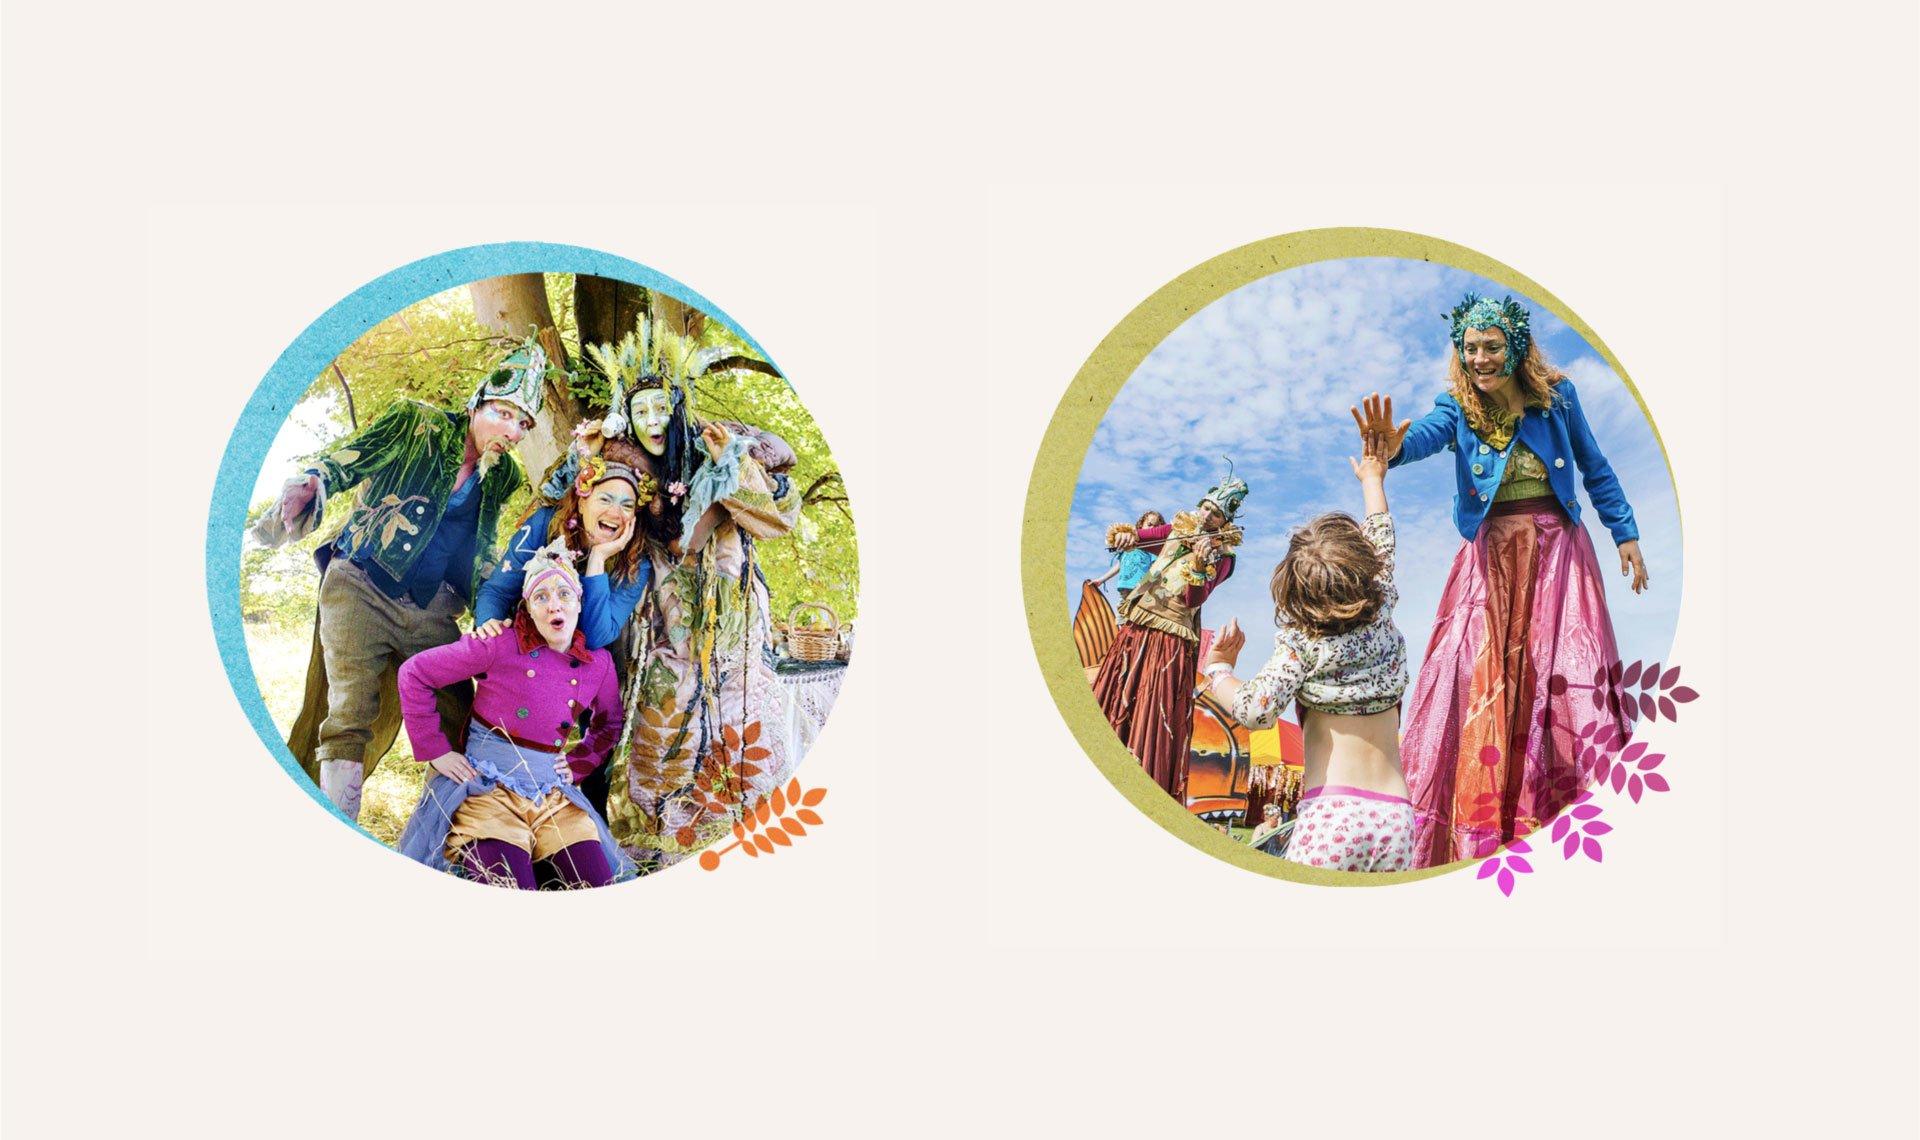 Rowanbank Environmantal Arts performers dressed up like woodland fairies